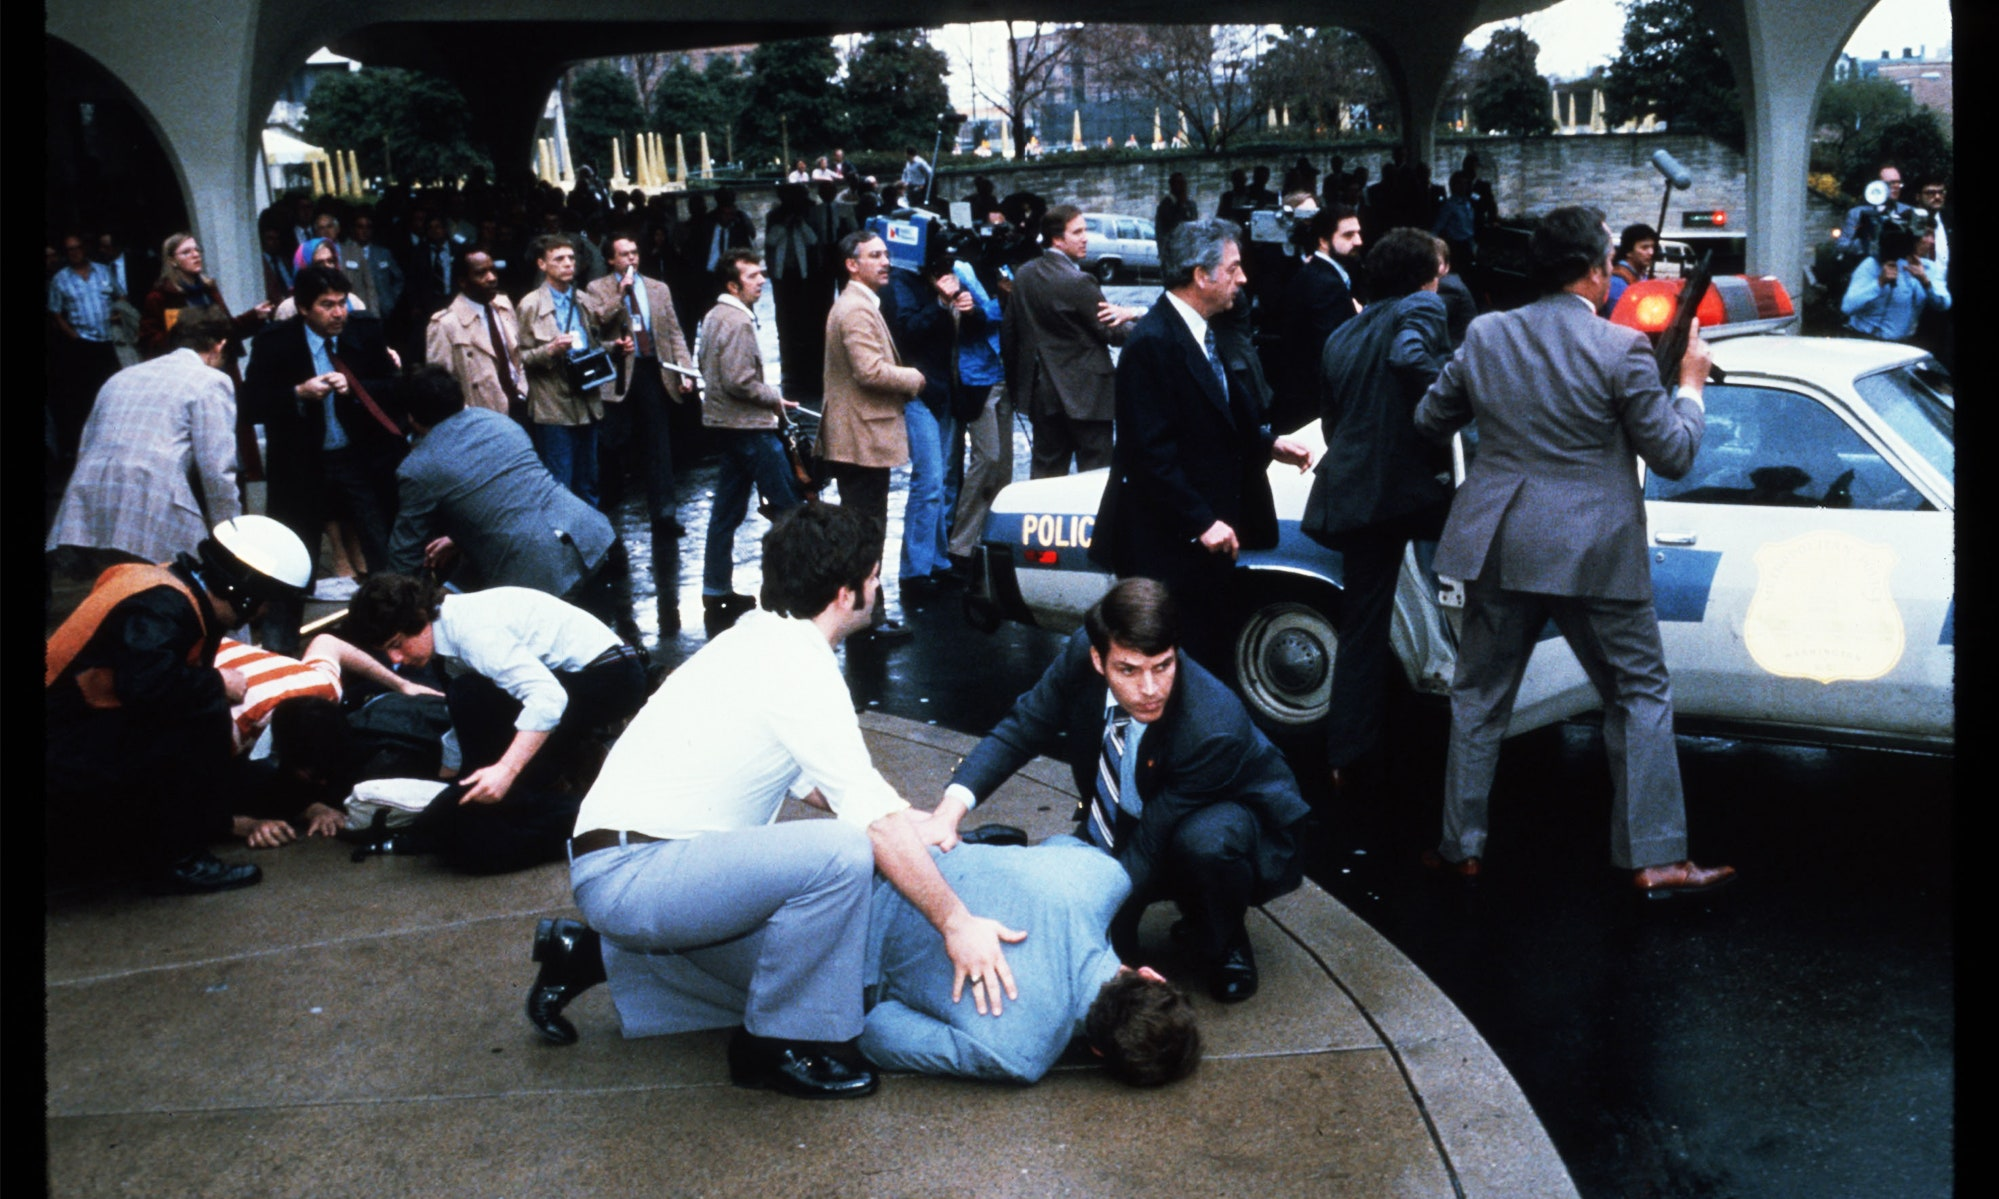 Ronal Reagan shot